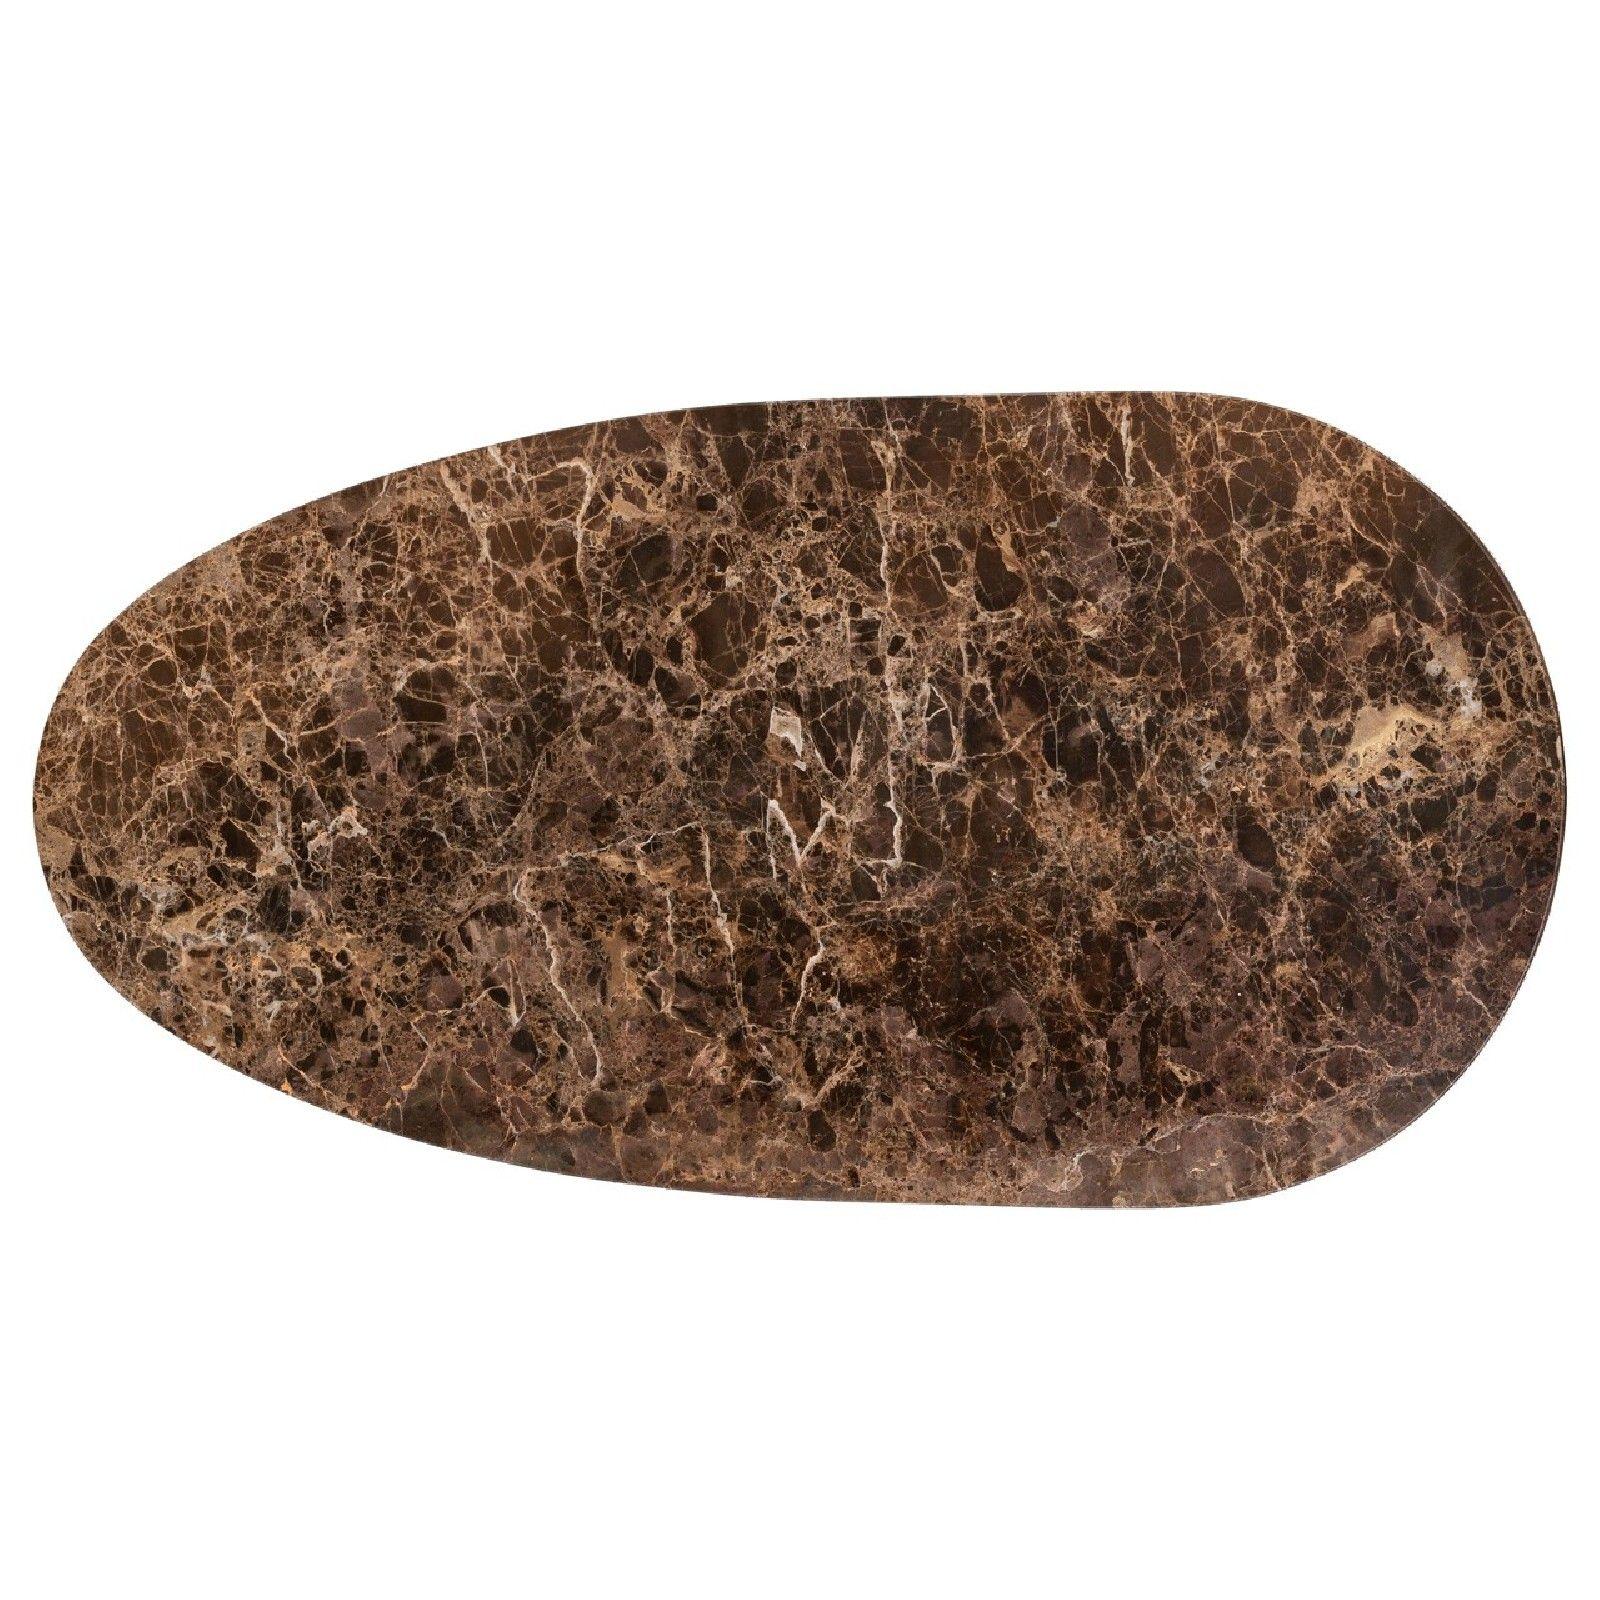 Table basse ovale - Métal et marbre brun empereur